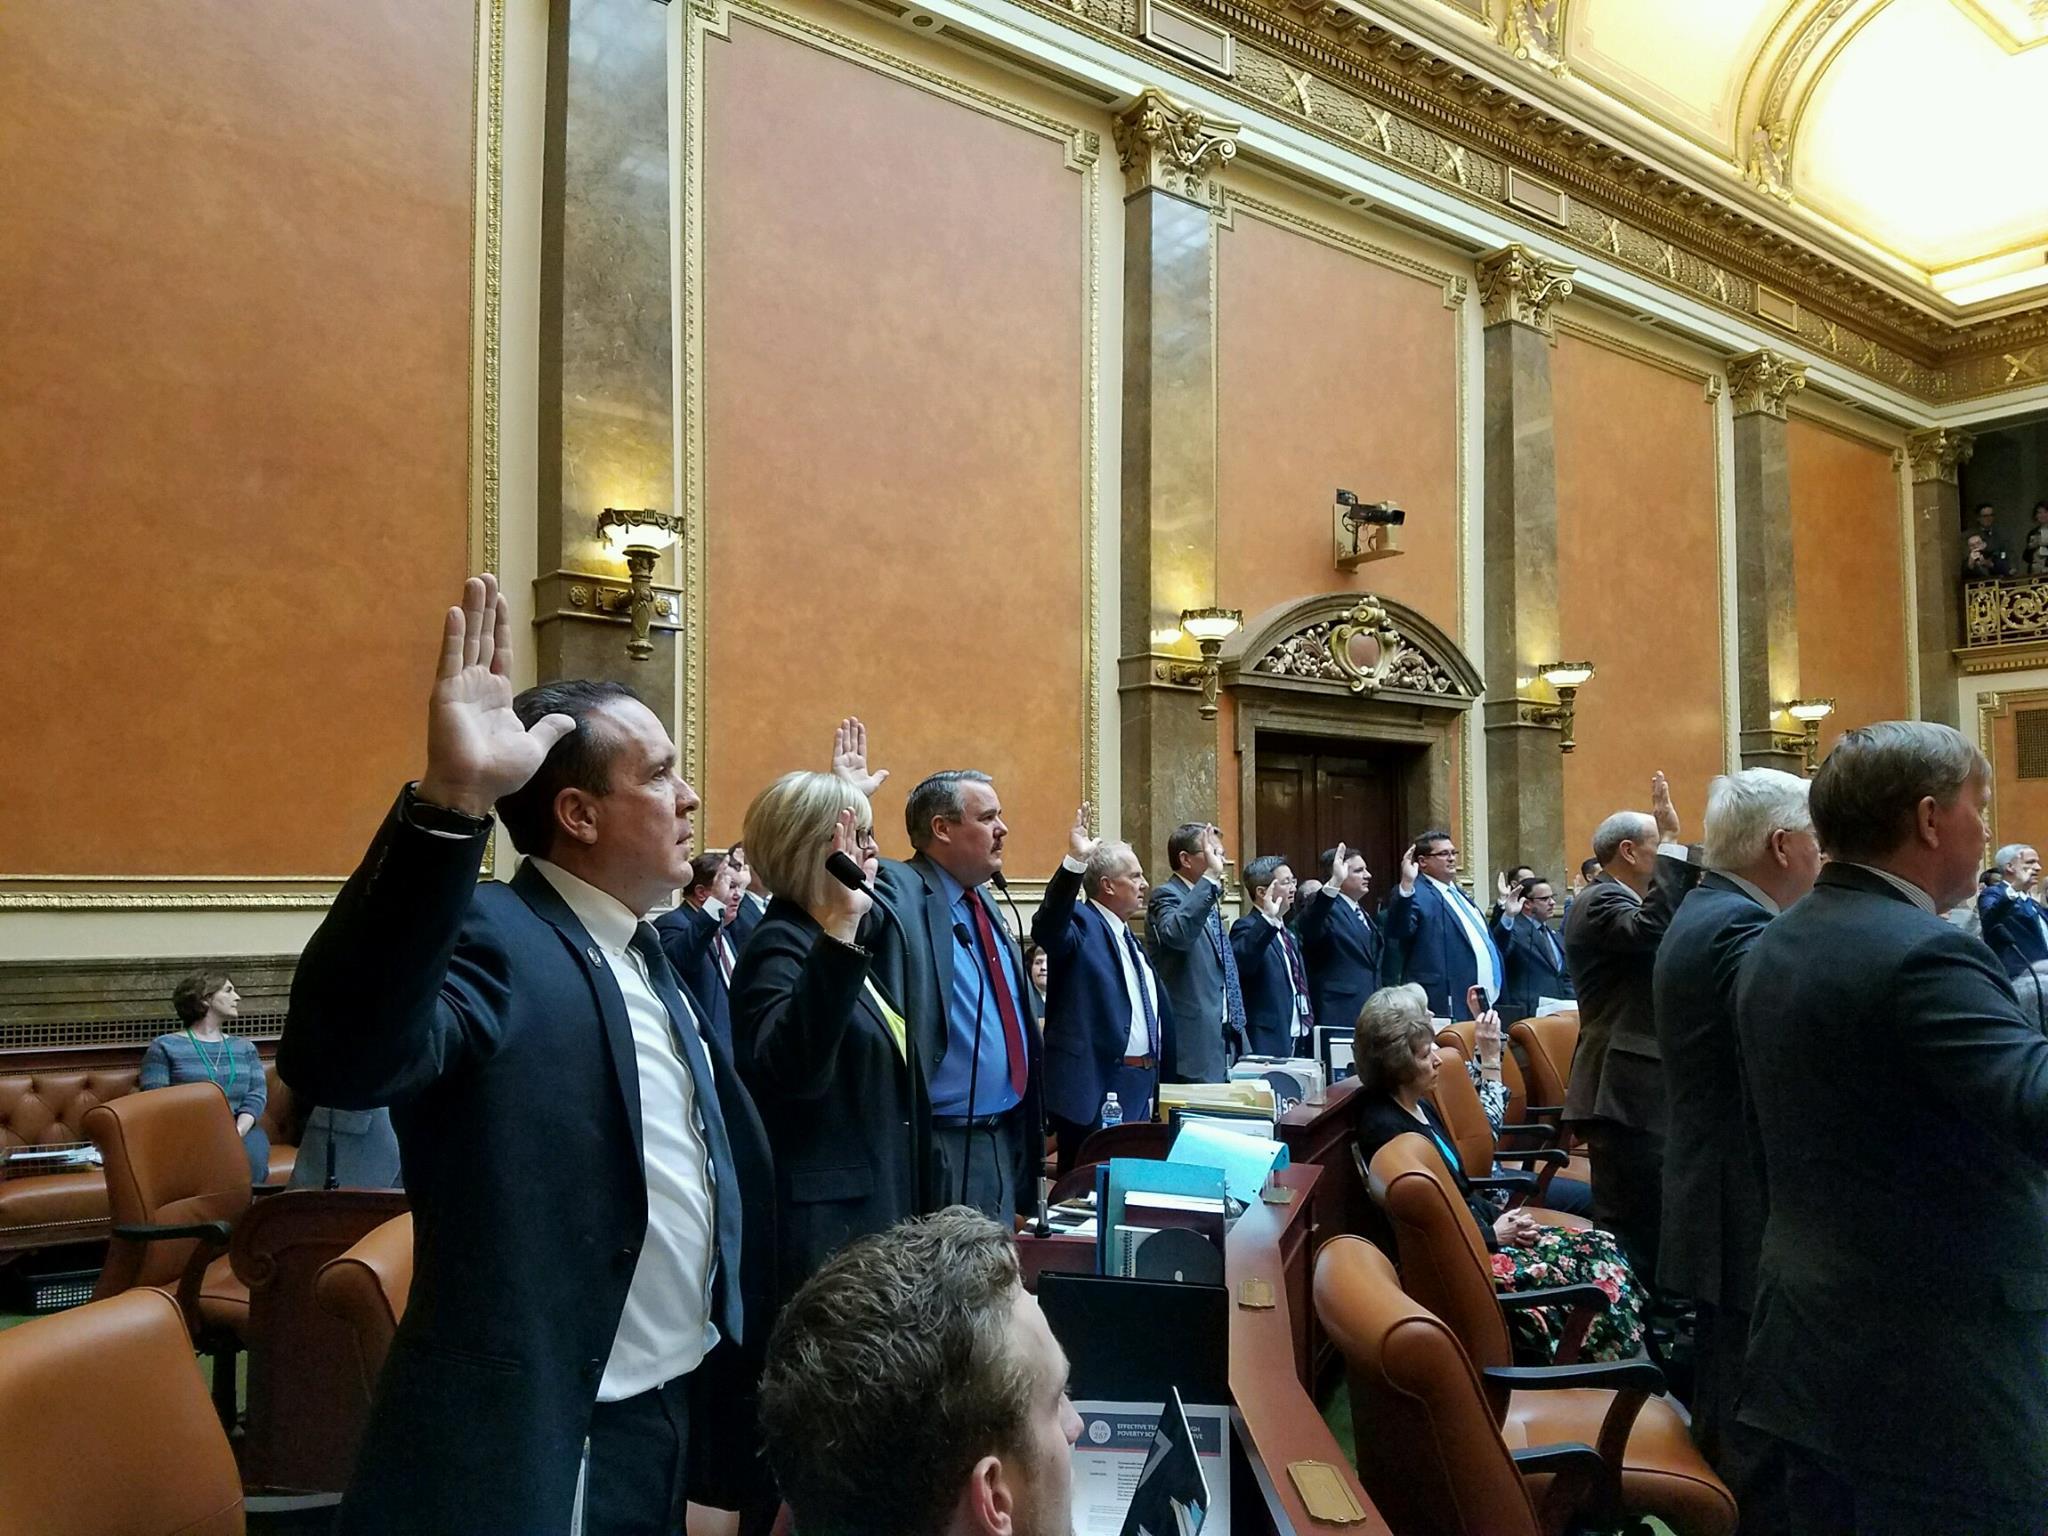 16299795 10154122885881044 3042568492315711066 o Utah lawmakers approve medical marijuana bill